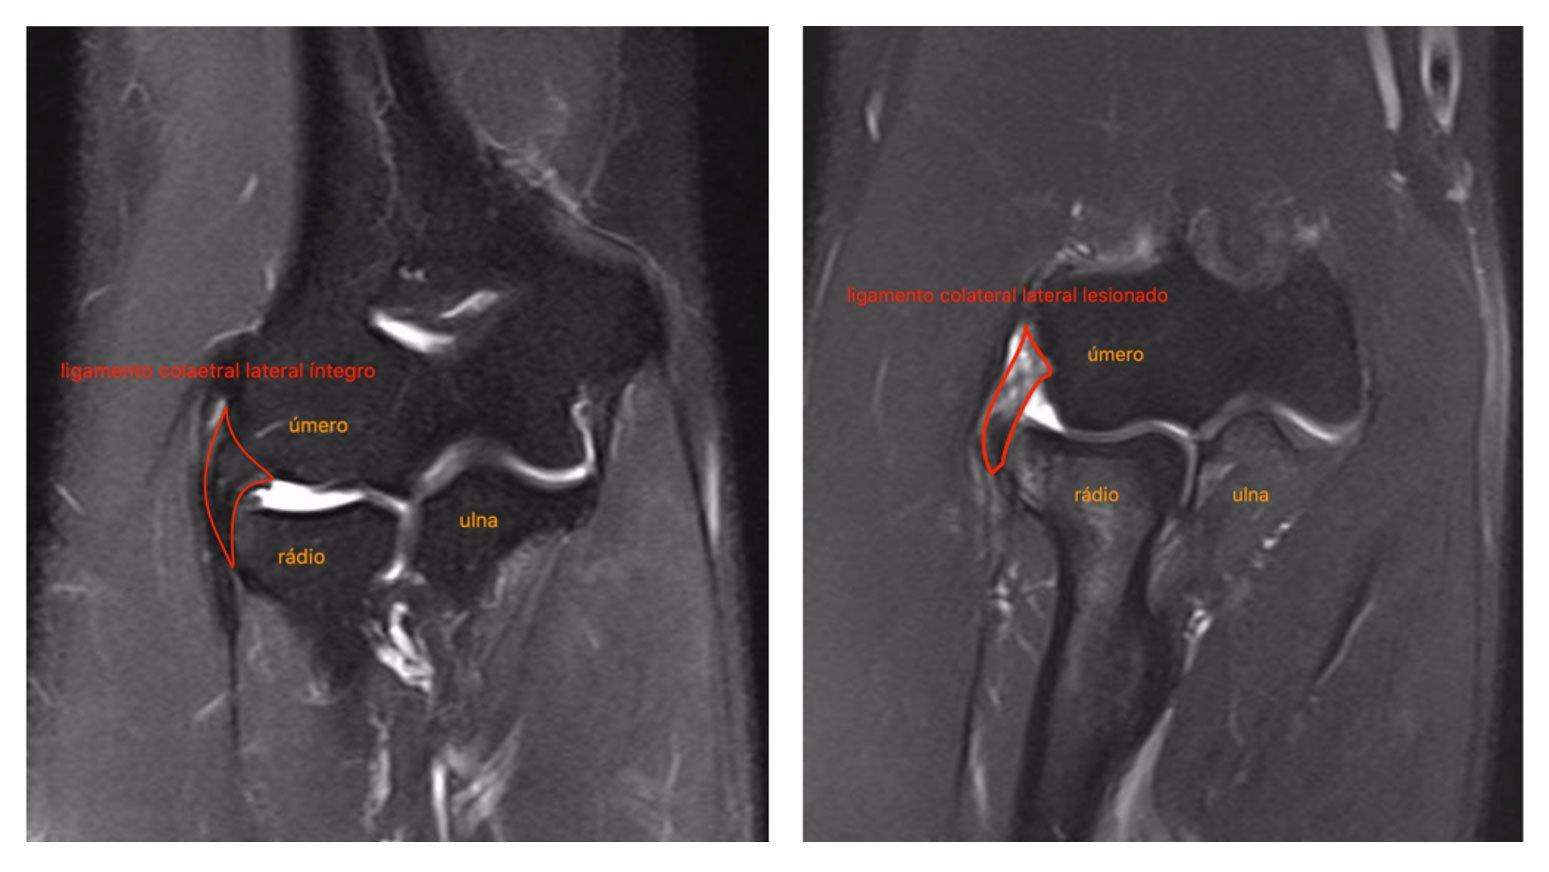 Ligamento Colateral Lateral | Dra. Verônica Chang